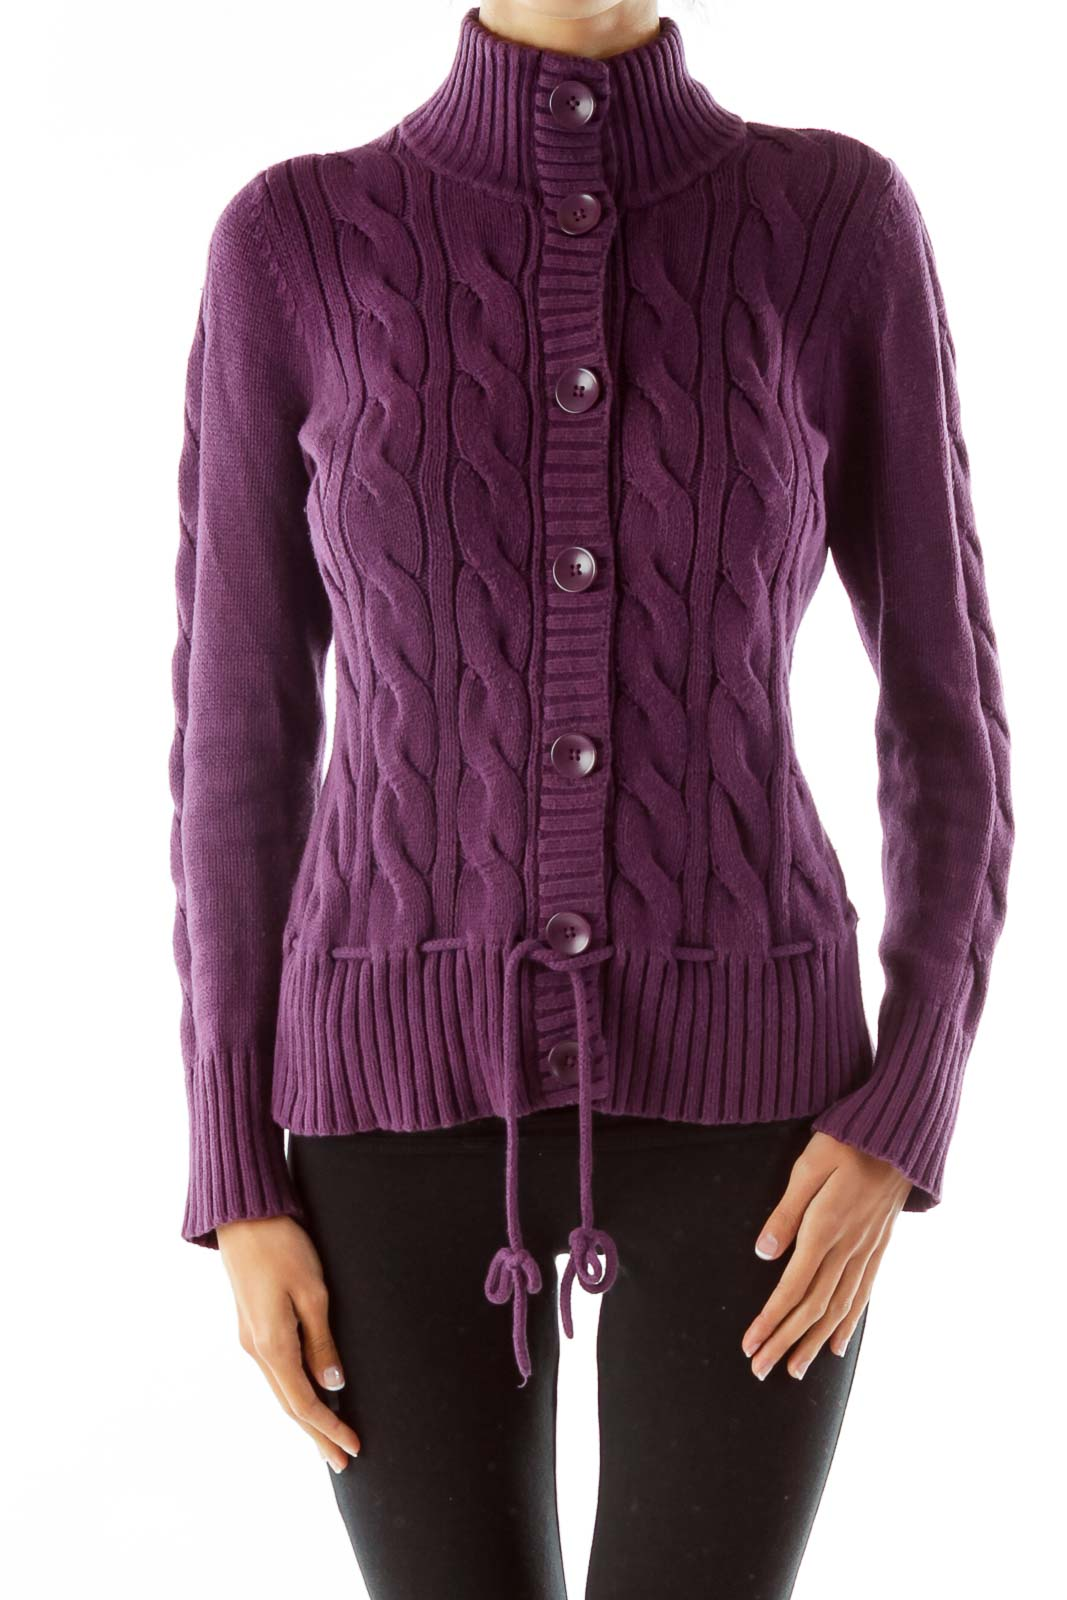 Purple Knit Tie Cardigan